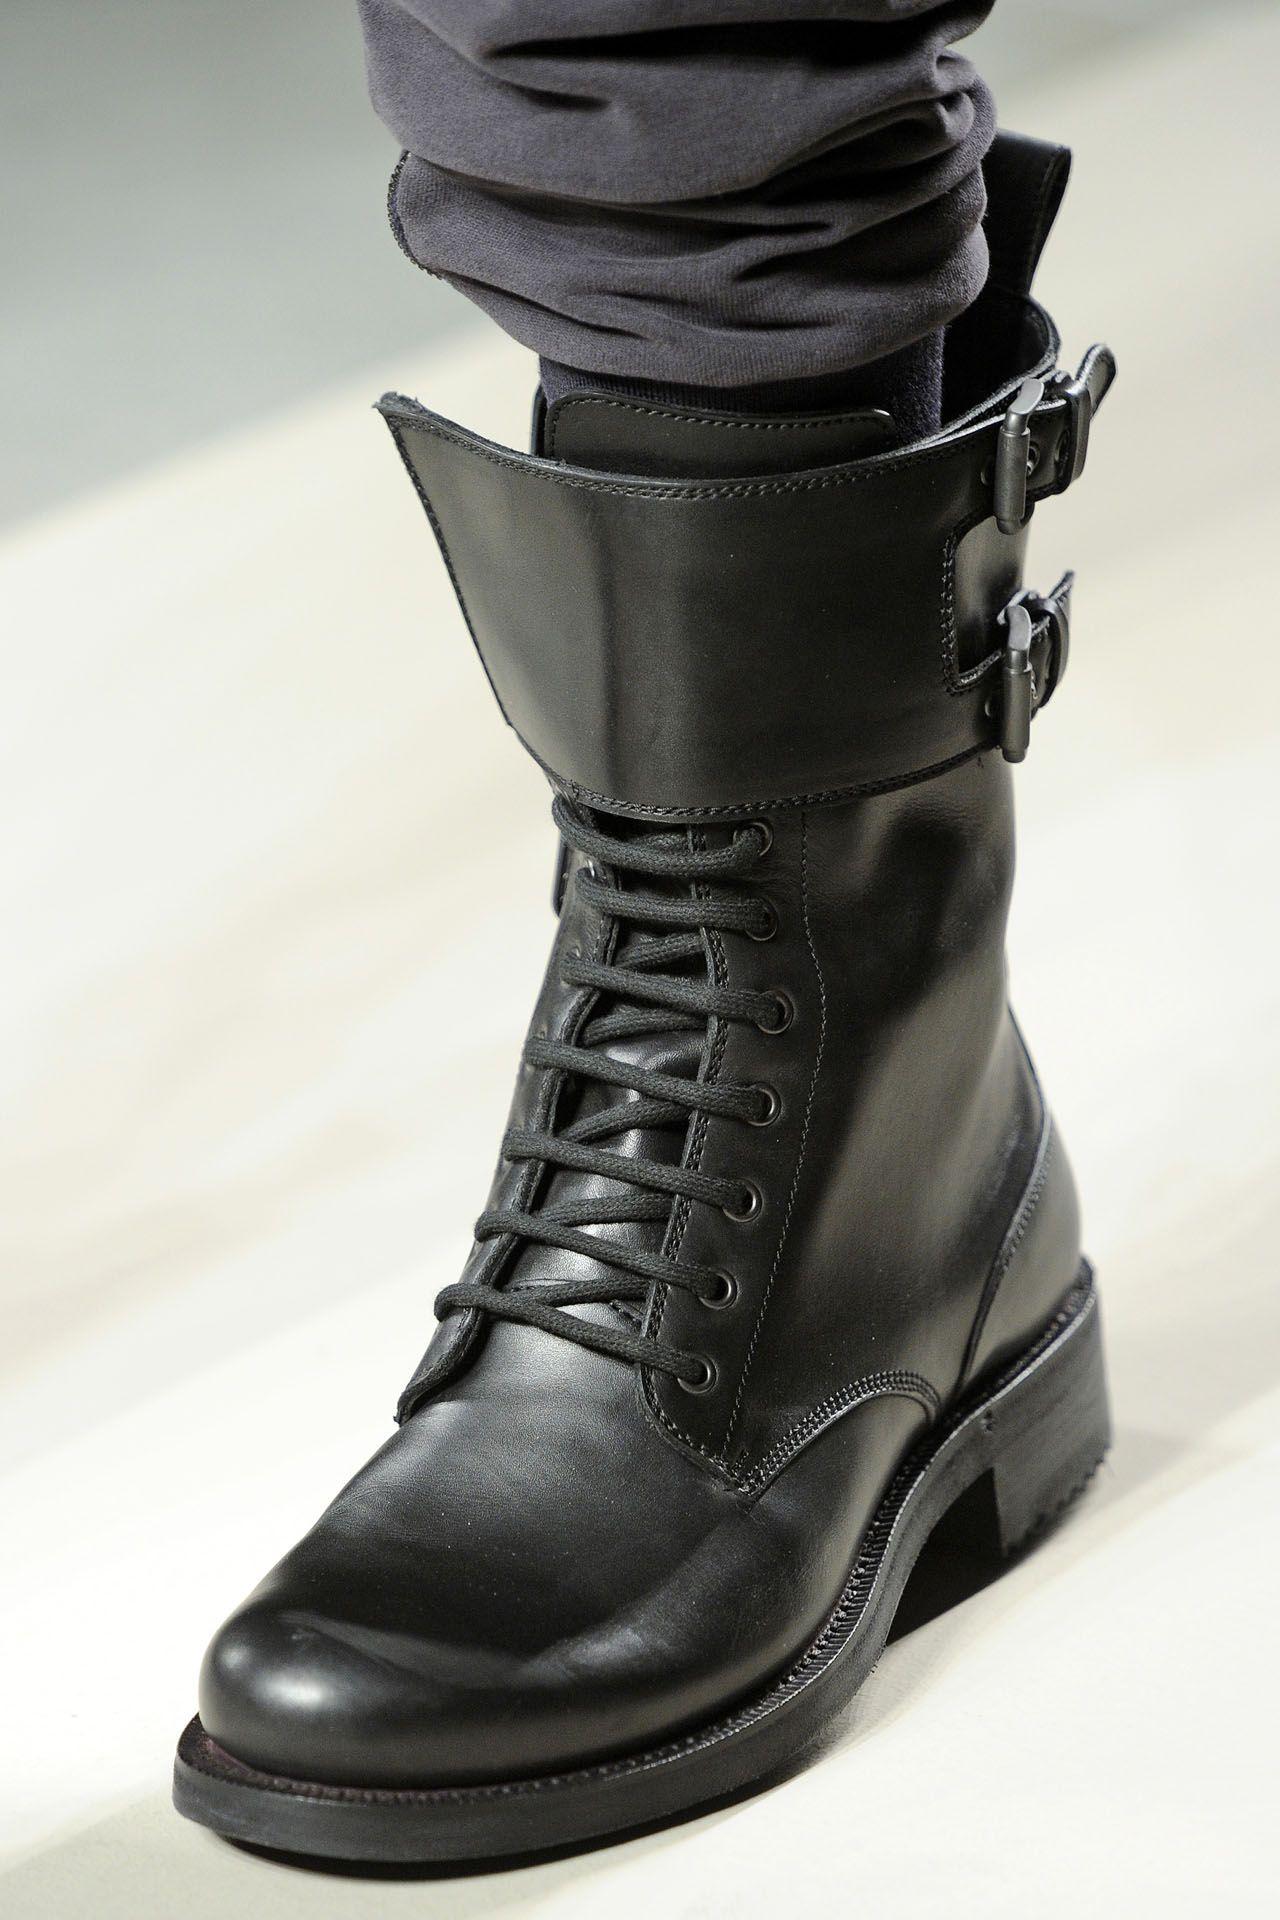 Shoes Trend Milan Men Fall Winter 2010 11 Trending Shoes Mens Dress Boots Boots